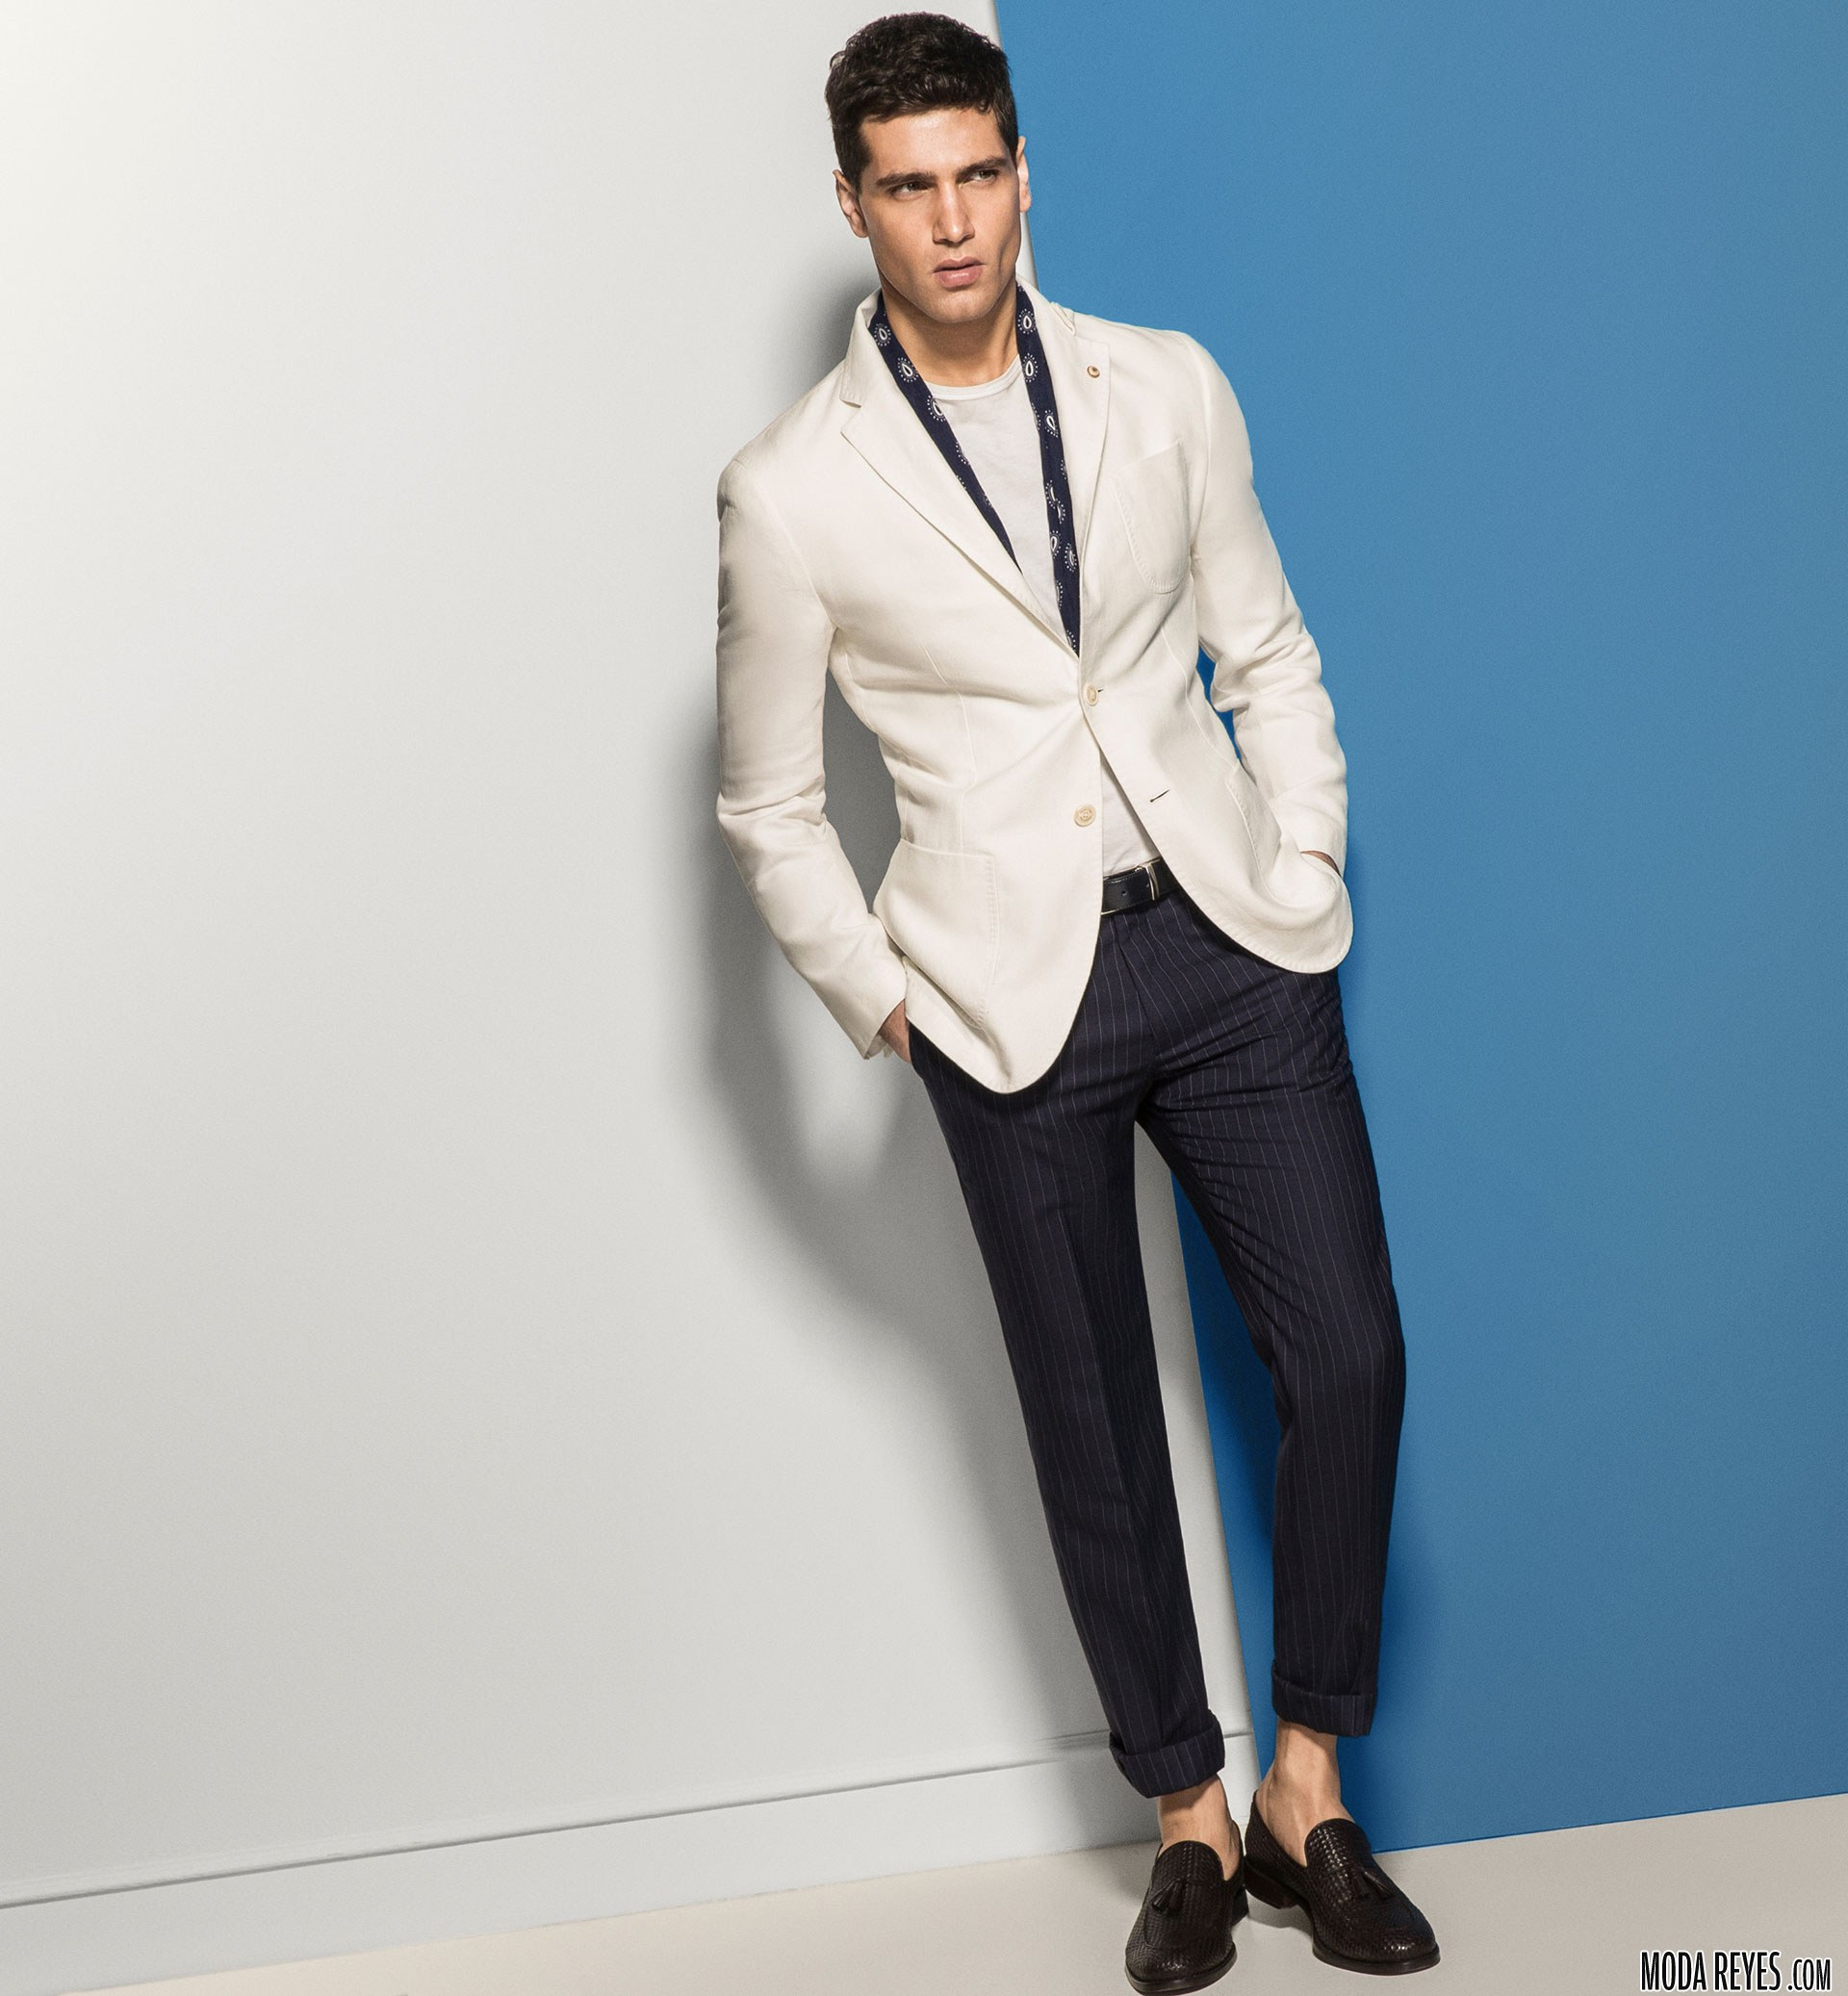 americana blanca y pantalón massimo dutti